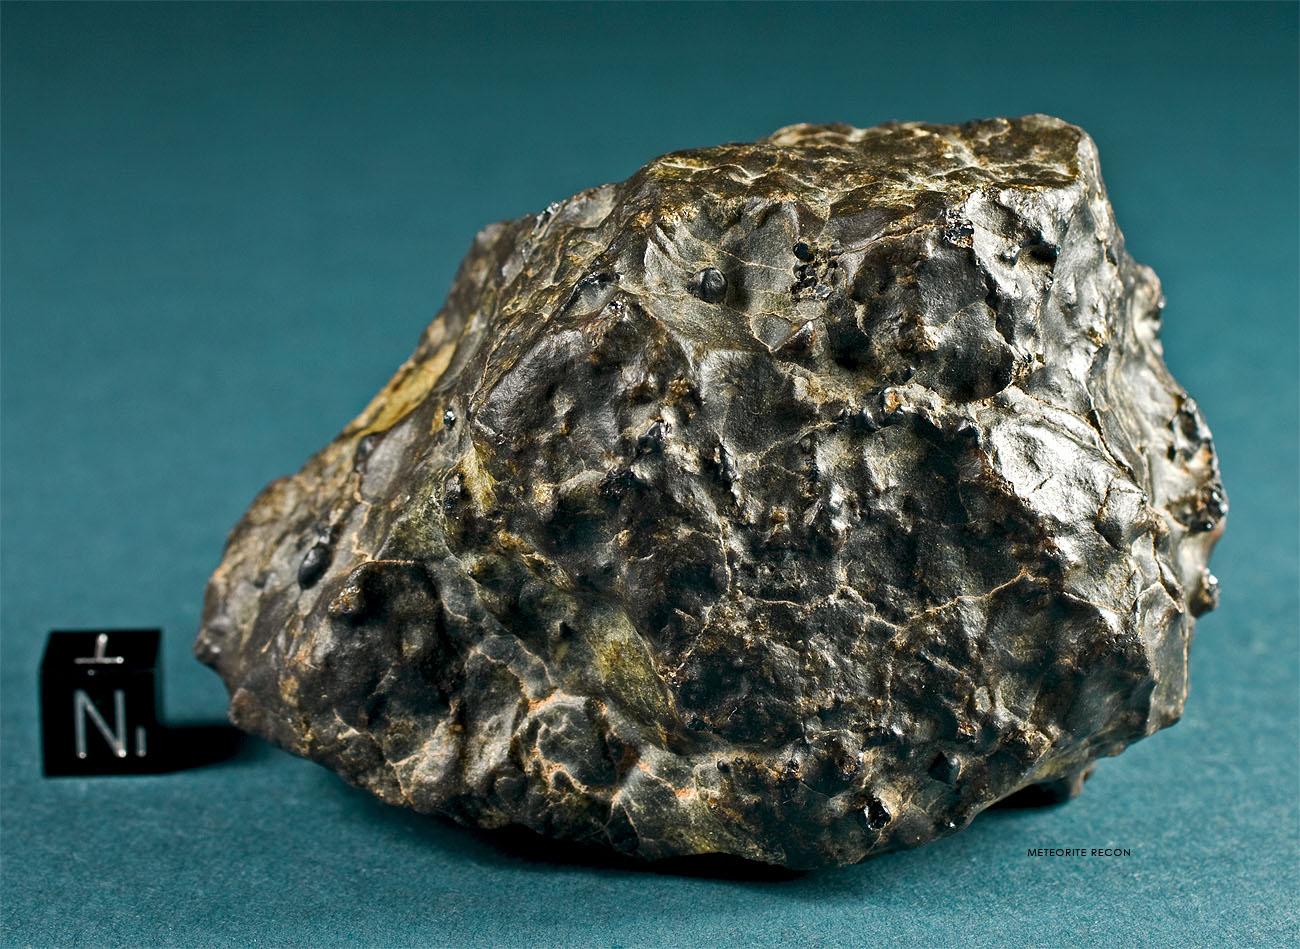 Meteorite recon collection achondrites meteorite recon - Meteore et meteorite ...